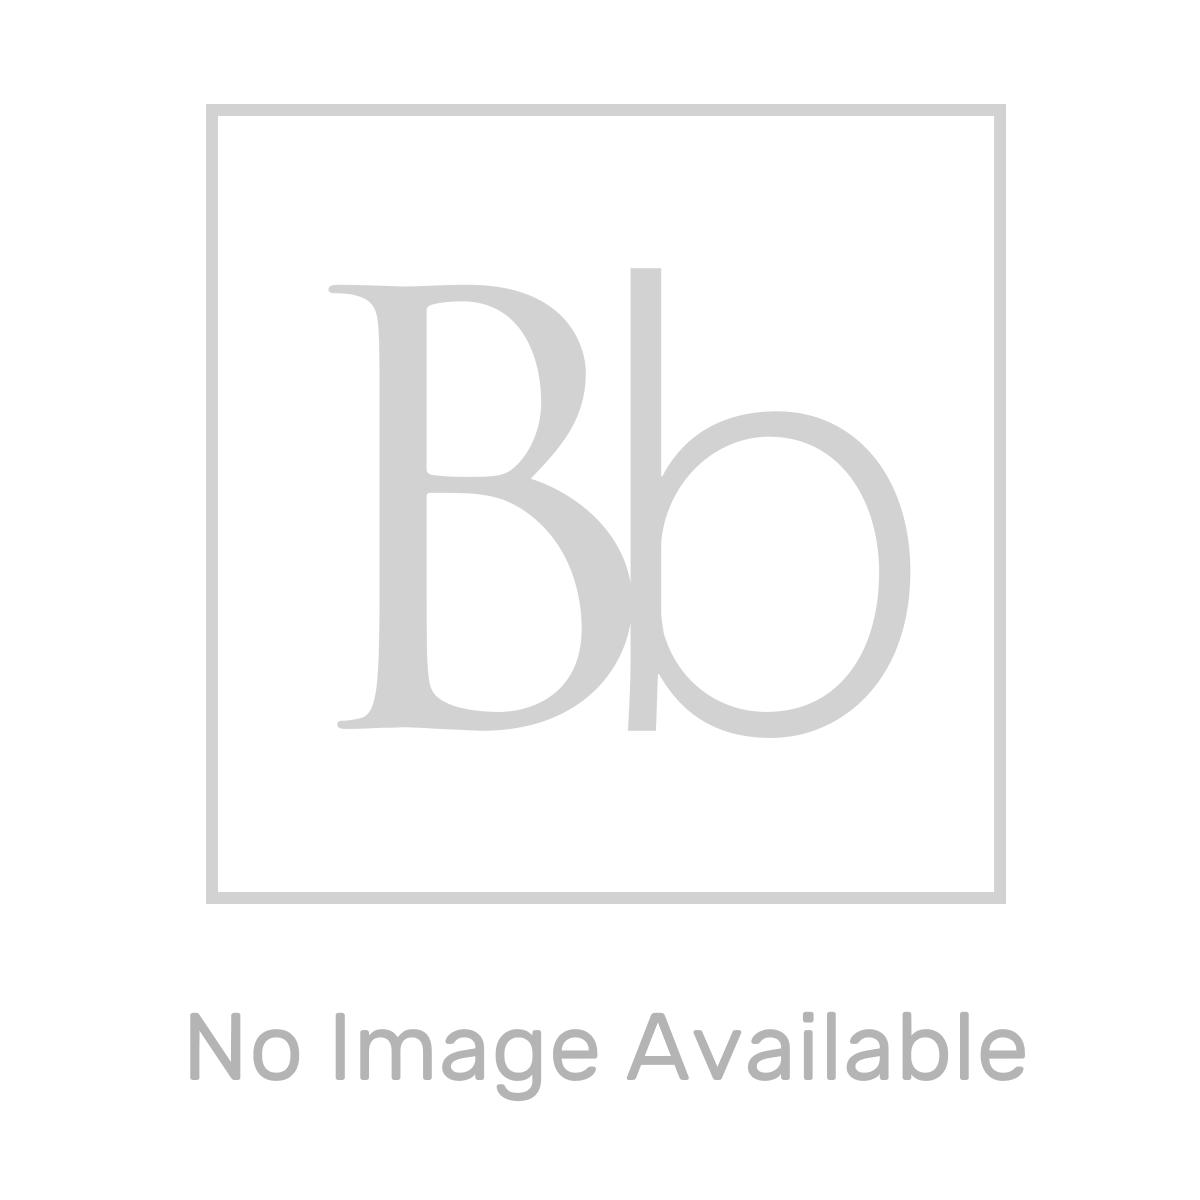 Frontline Compact Bath Shower Mixer Tap